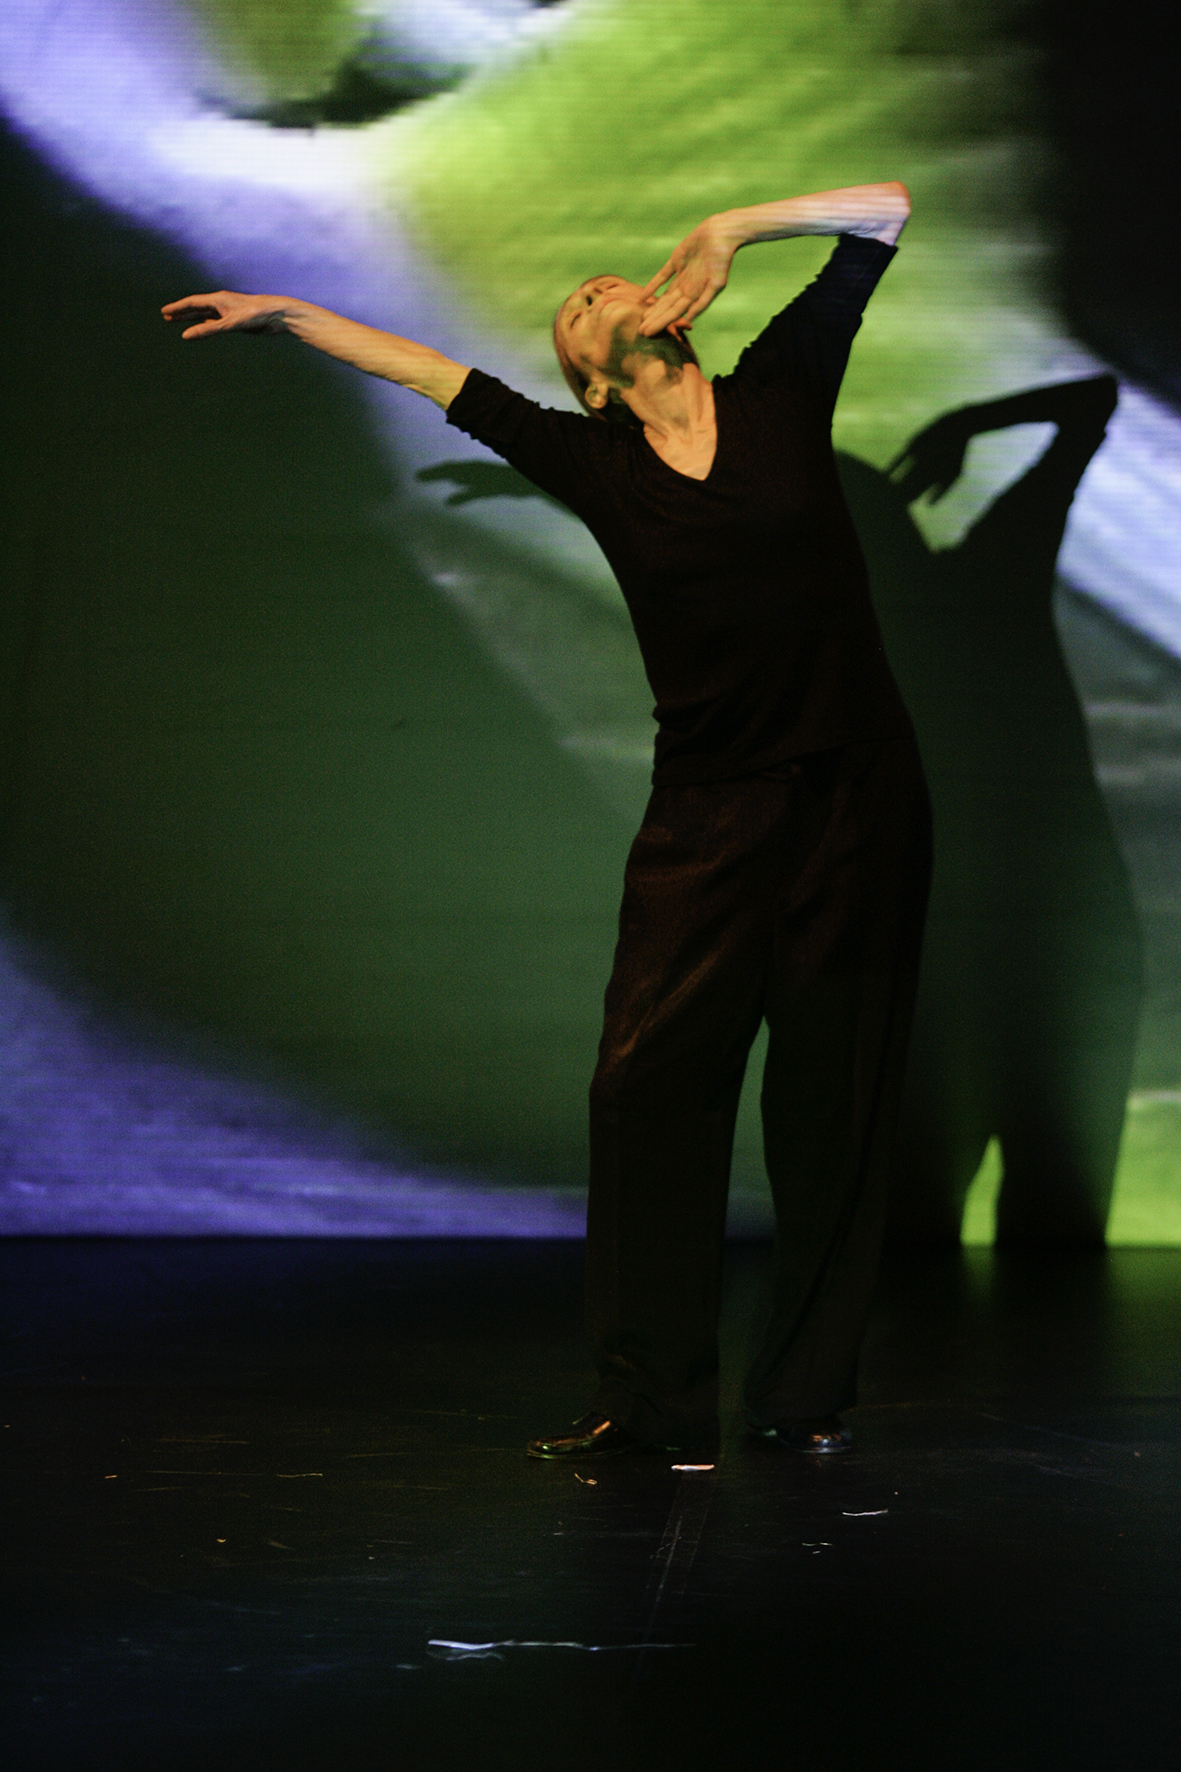 Jochen Viehoff: Pina Bausch tanzt ein Solo in Danzón (Ausschnitt), Fotografie, © Jochen Viehoff